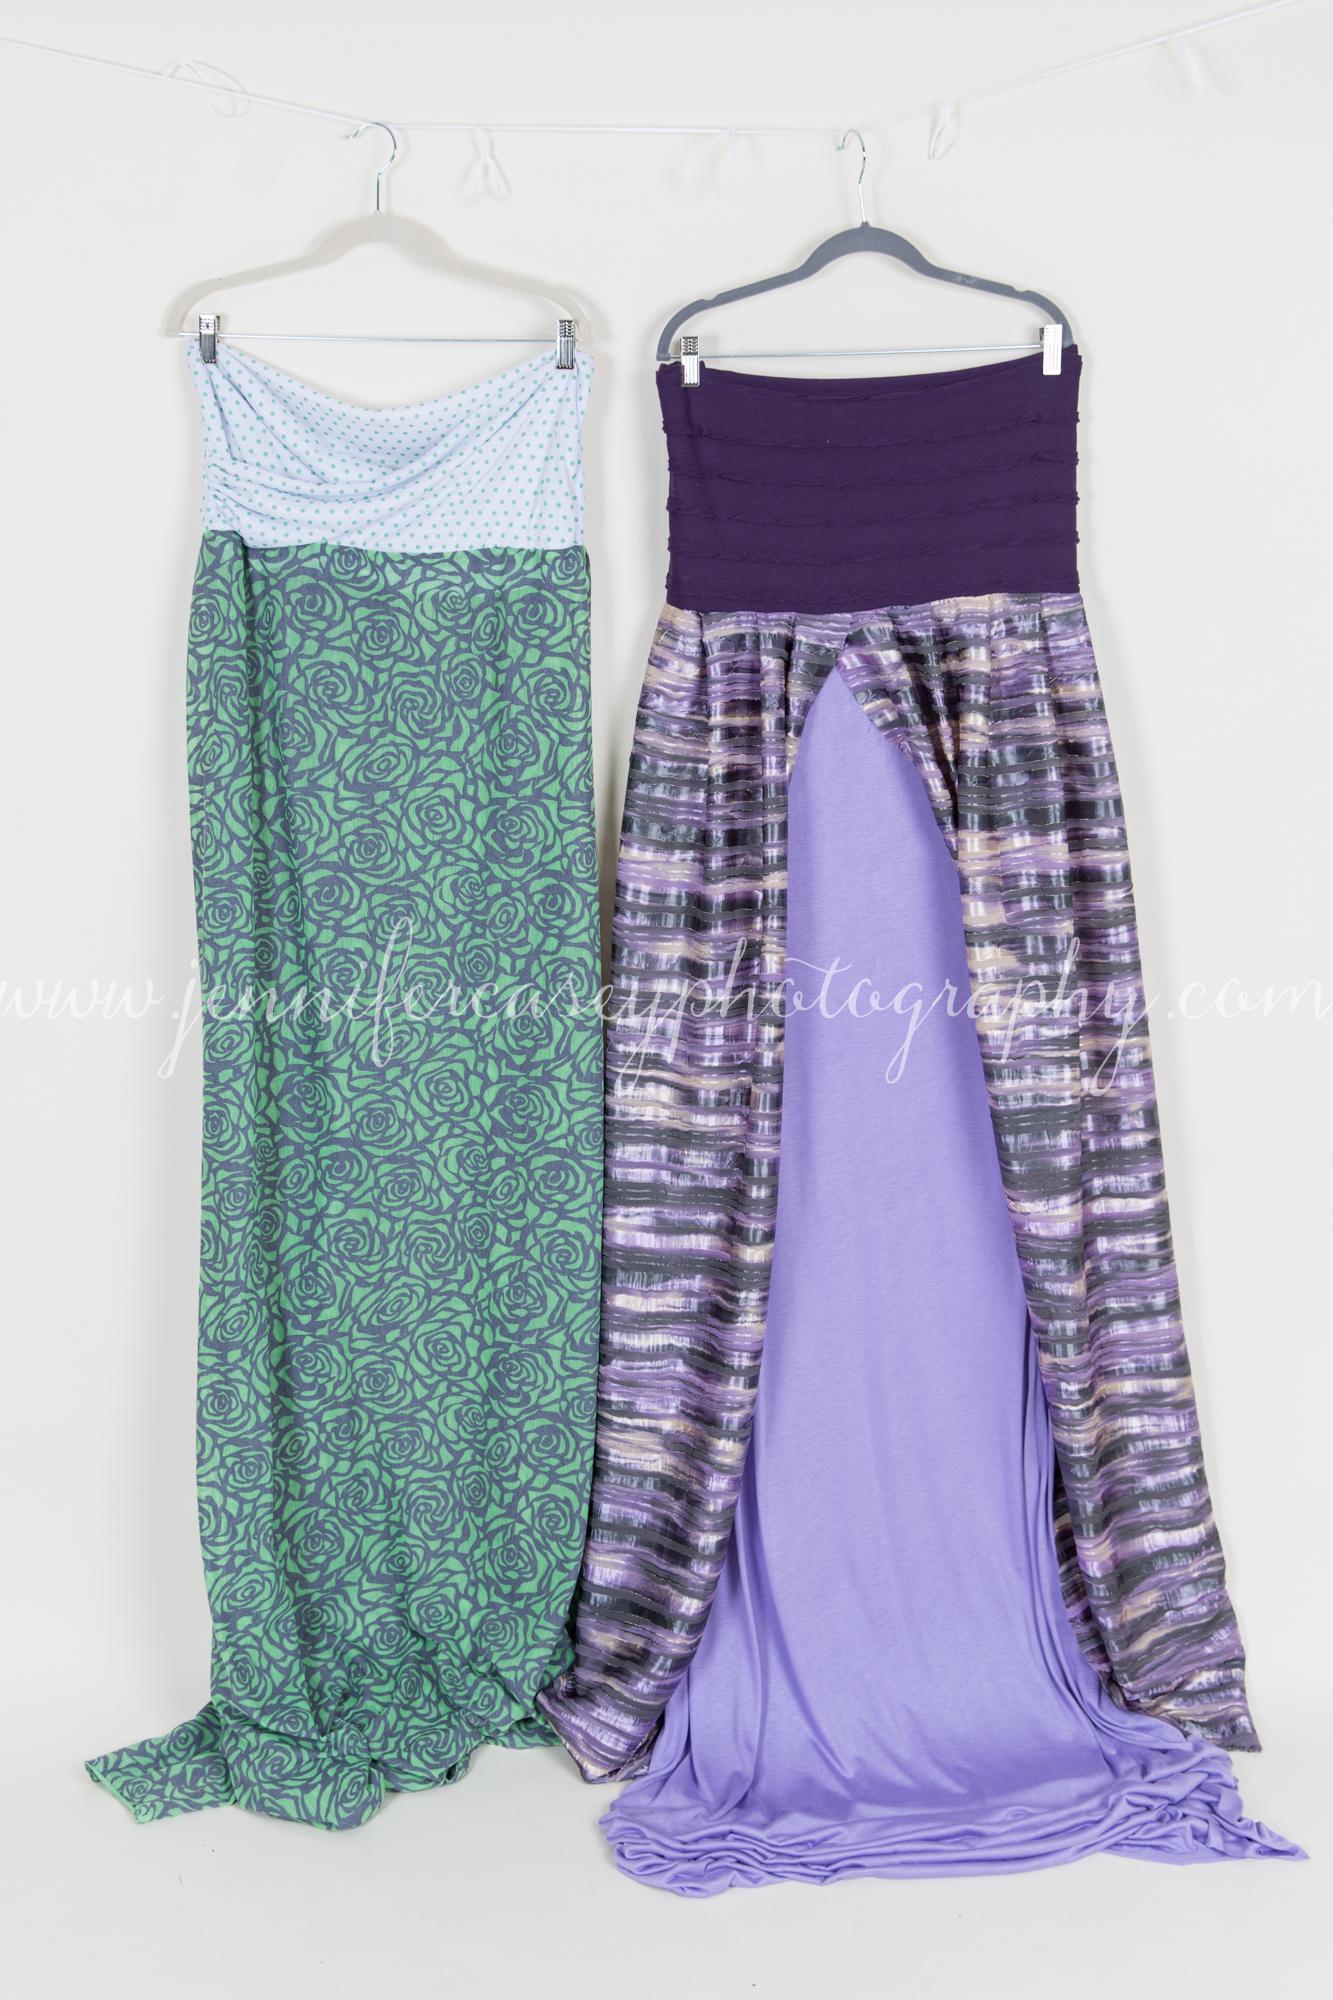 Studio Props Maternity Dresses-6.jpg